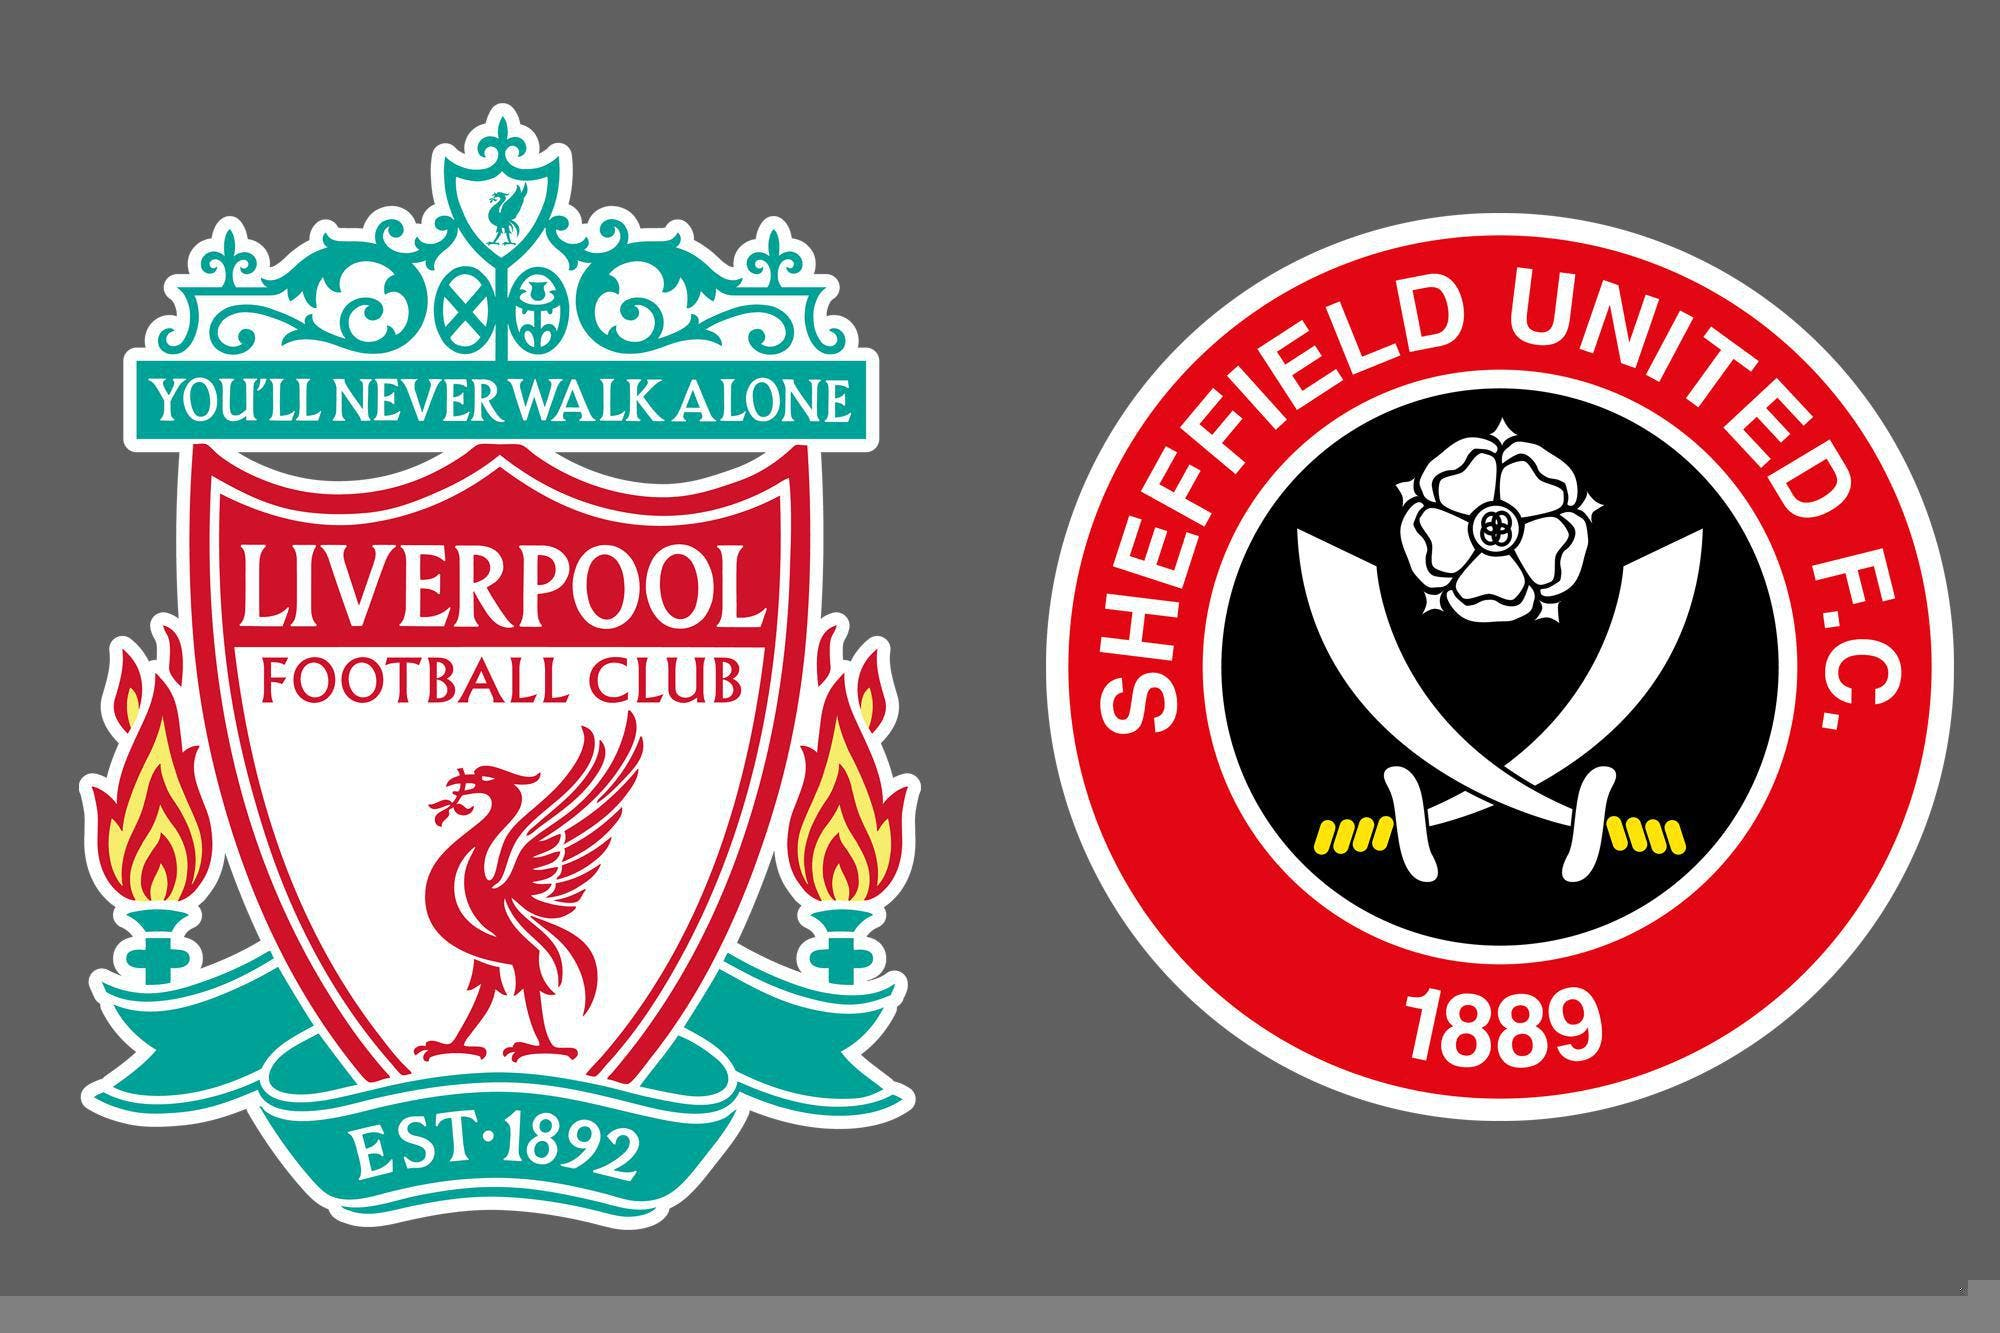 Premier League de Inglaterra: Liverpool venció por 2-1 a Sheffield United como local